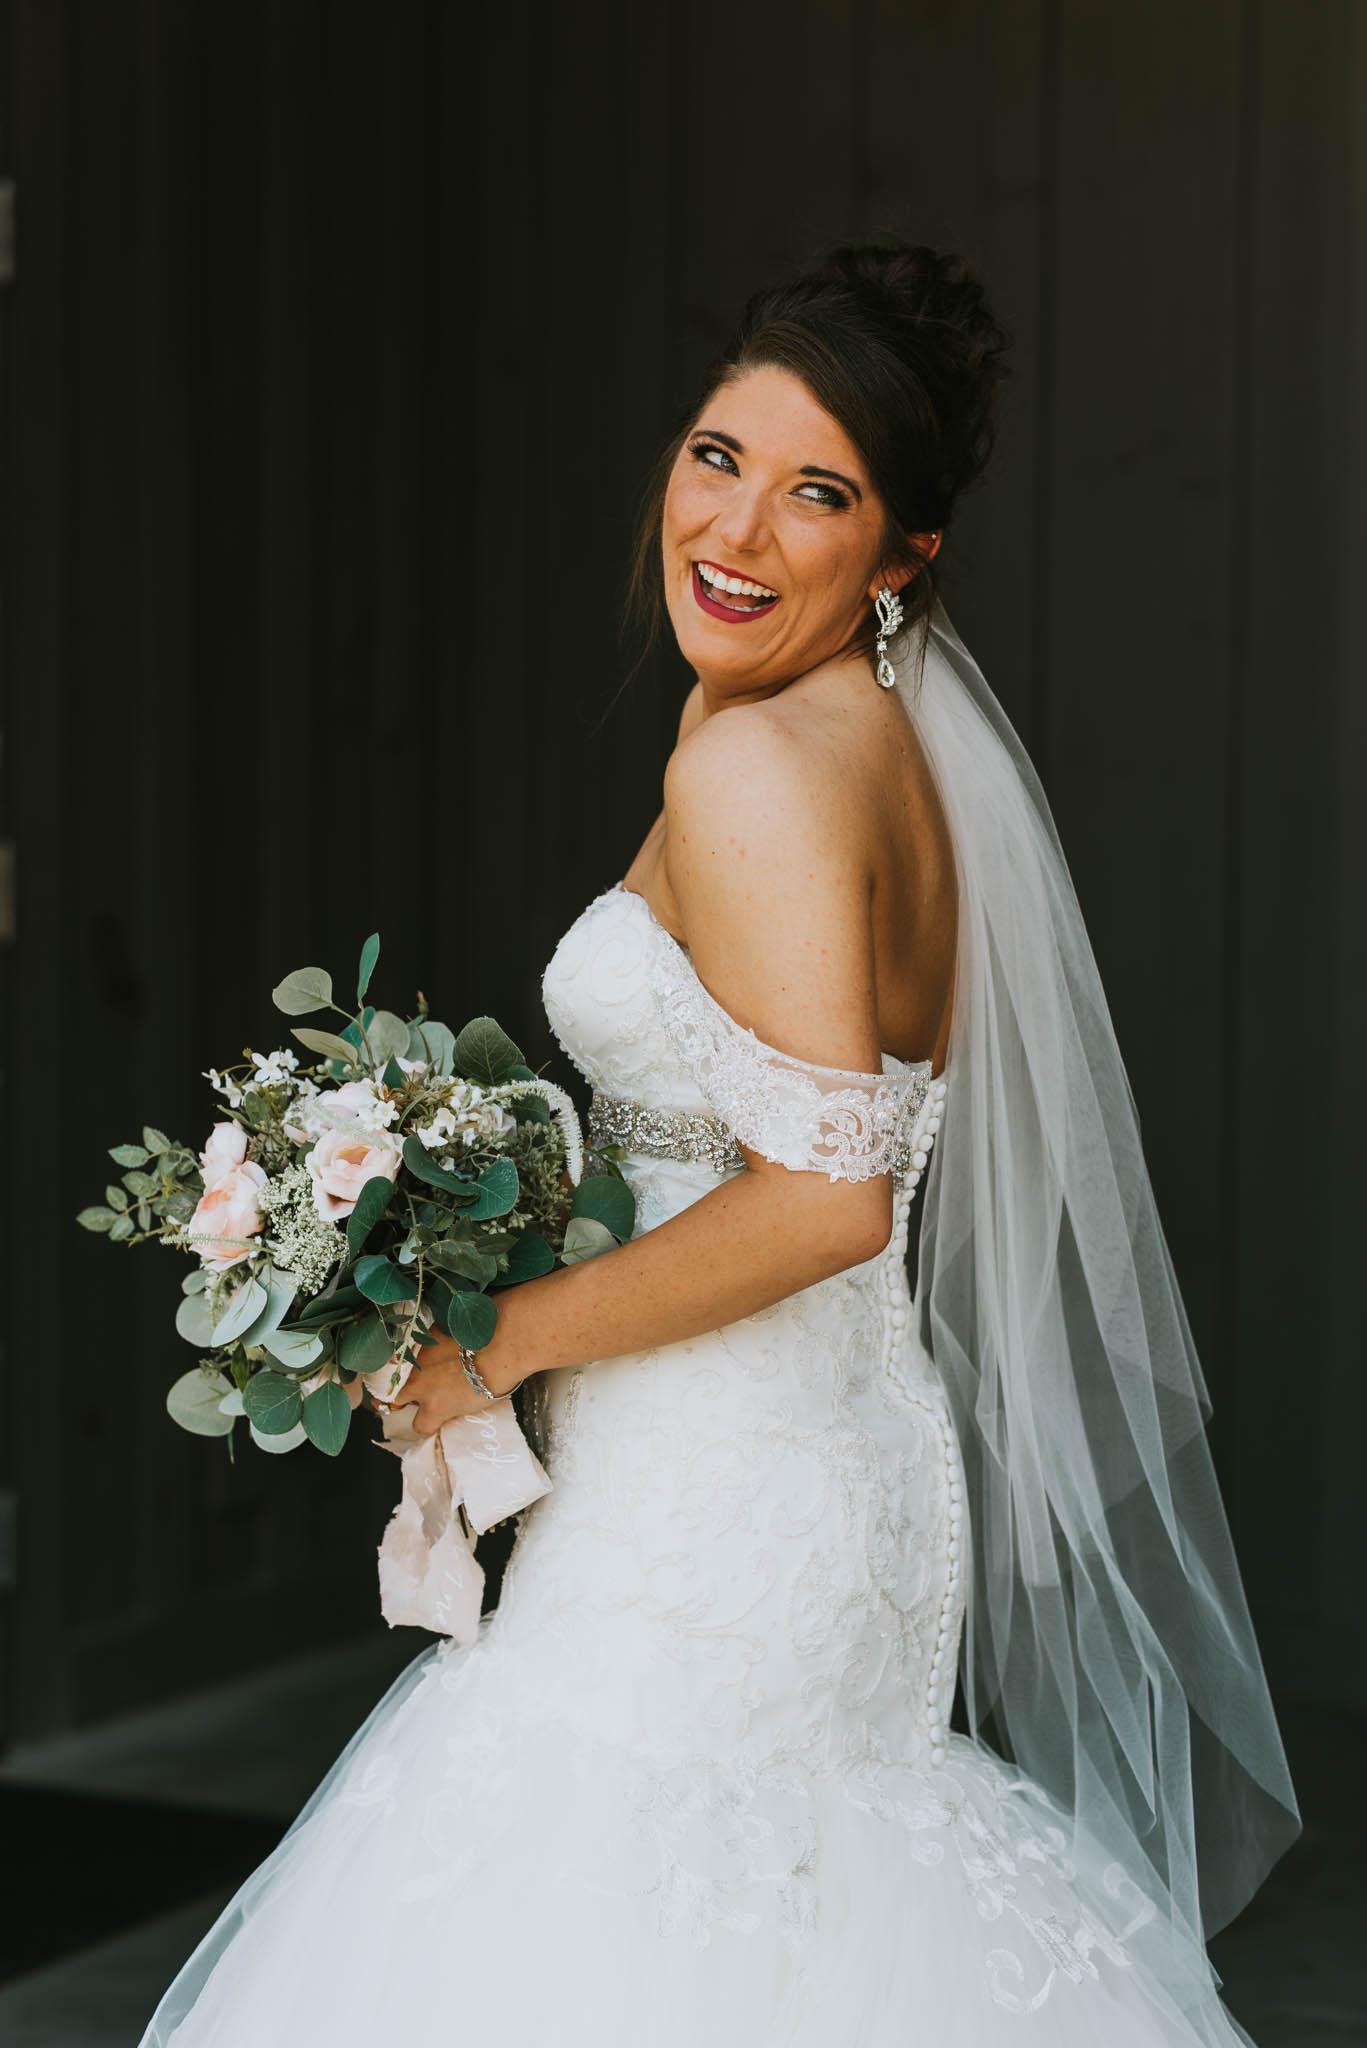 Howe Farms Wedding, Chattanooga, TN, Northeast Tennessee Wedding Photographer, East Tennessee Wedding Photographer, Knoxville, TN Wedding Photographer